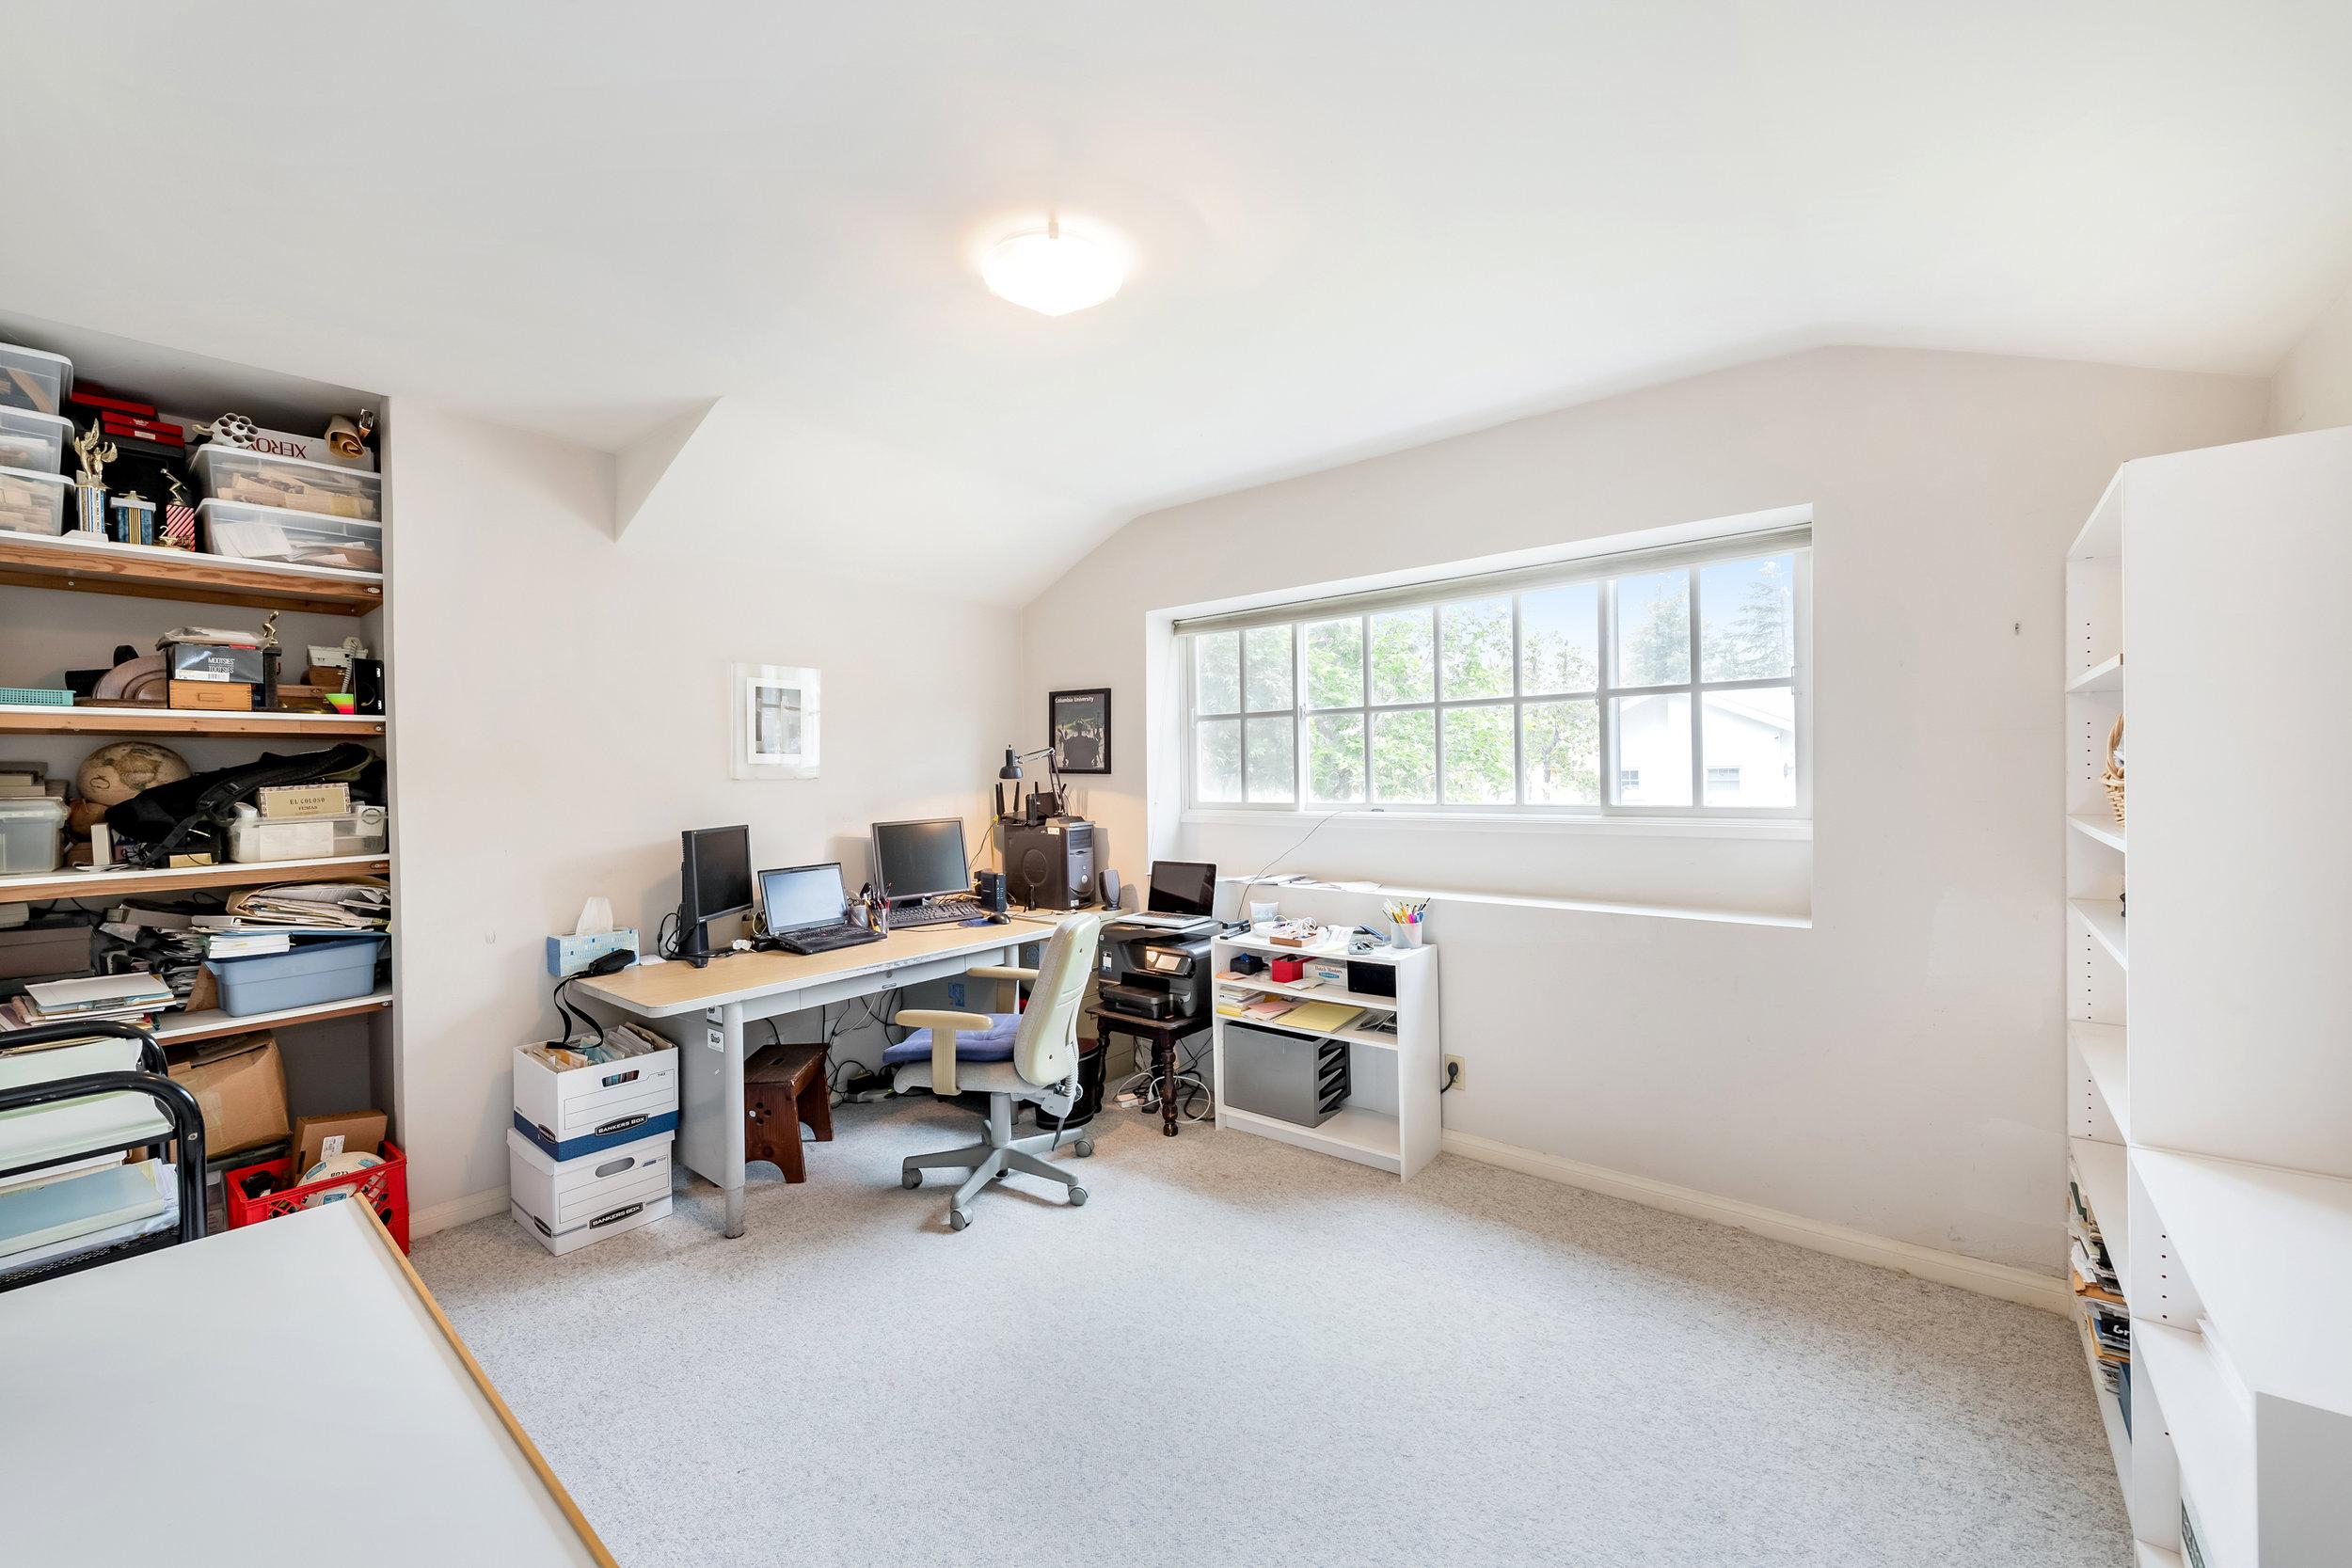 28 Bedroom 4.jpg